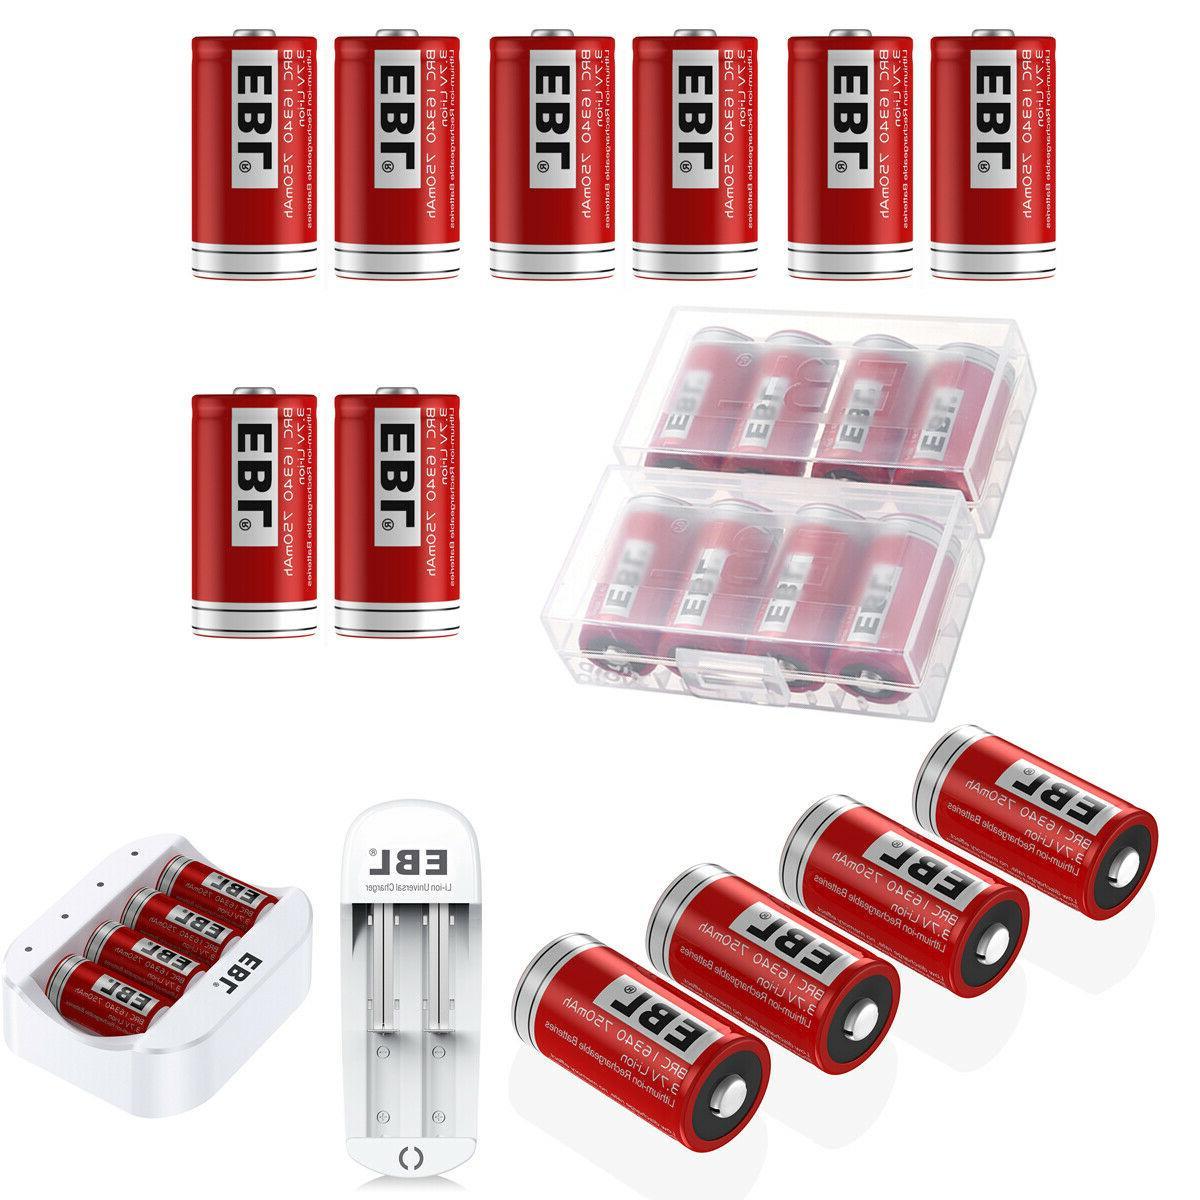 3 7v 16340 cr123a li ion rechargeable